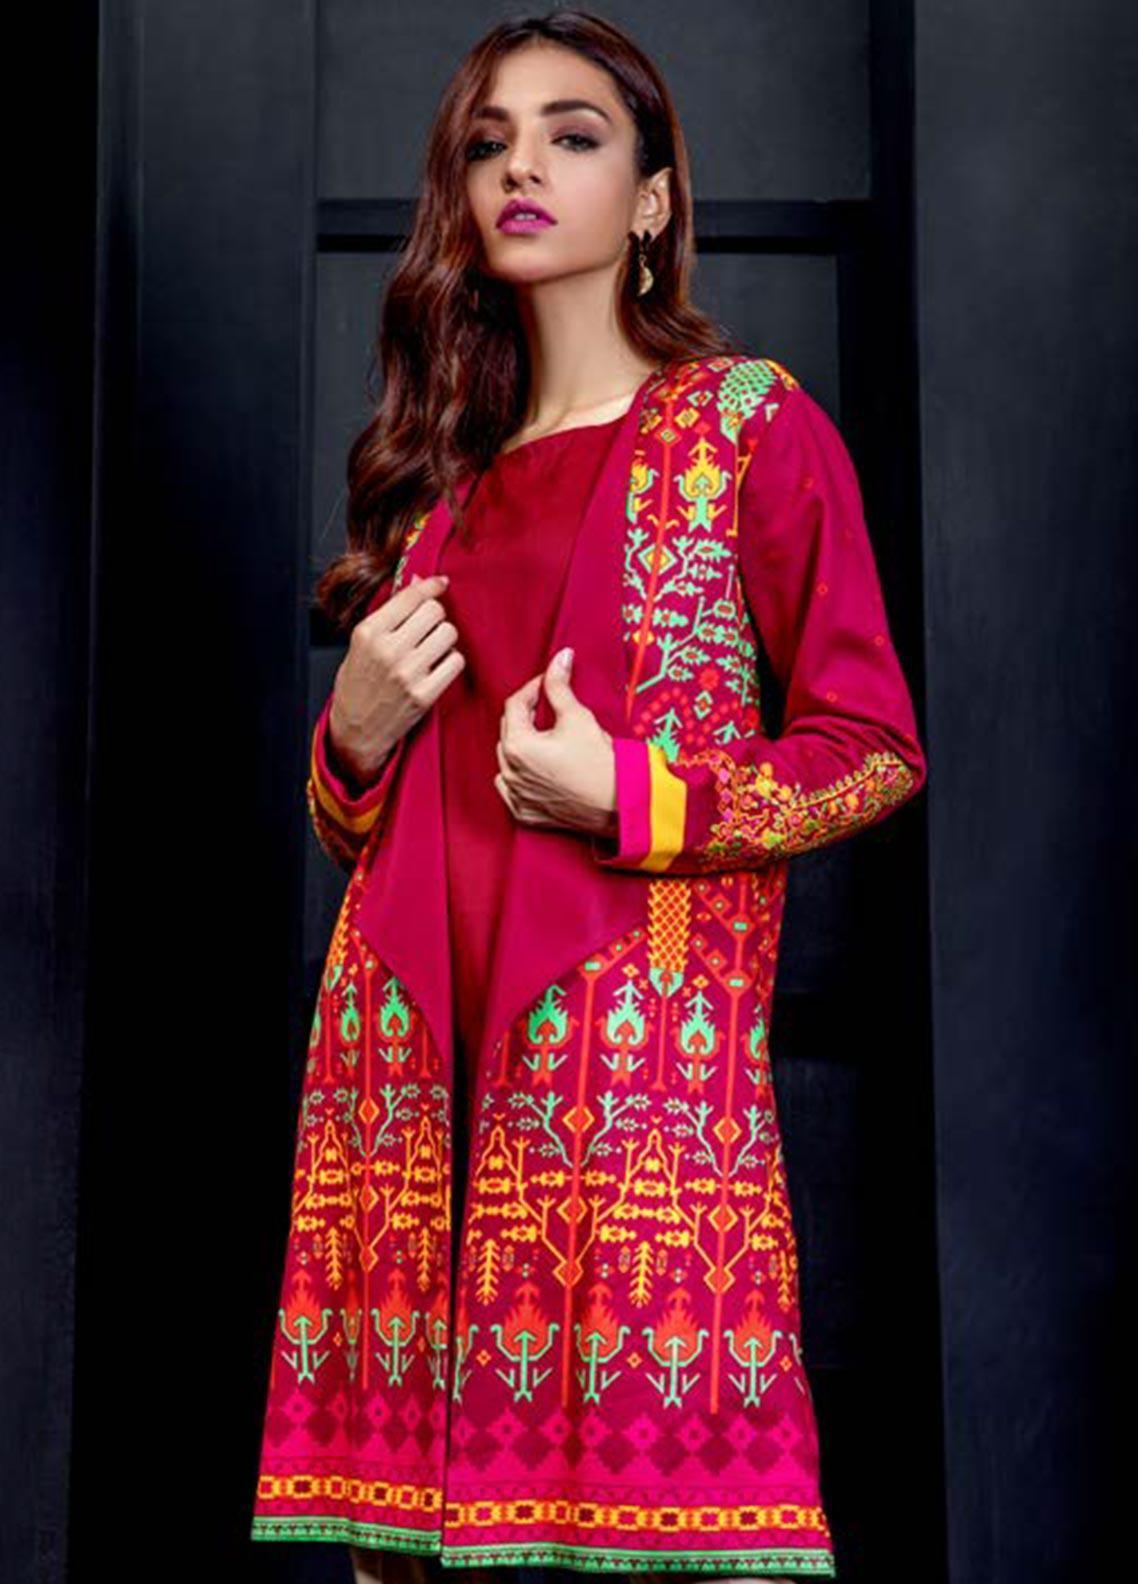 Orient Textile Embroidered Cottel Linen Unstitched Kurties OT19W 156 ETHNIC TWIST B - Winter Collection